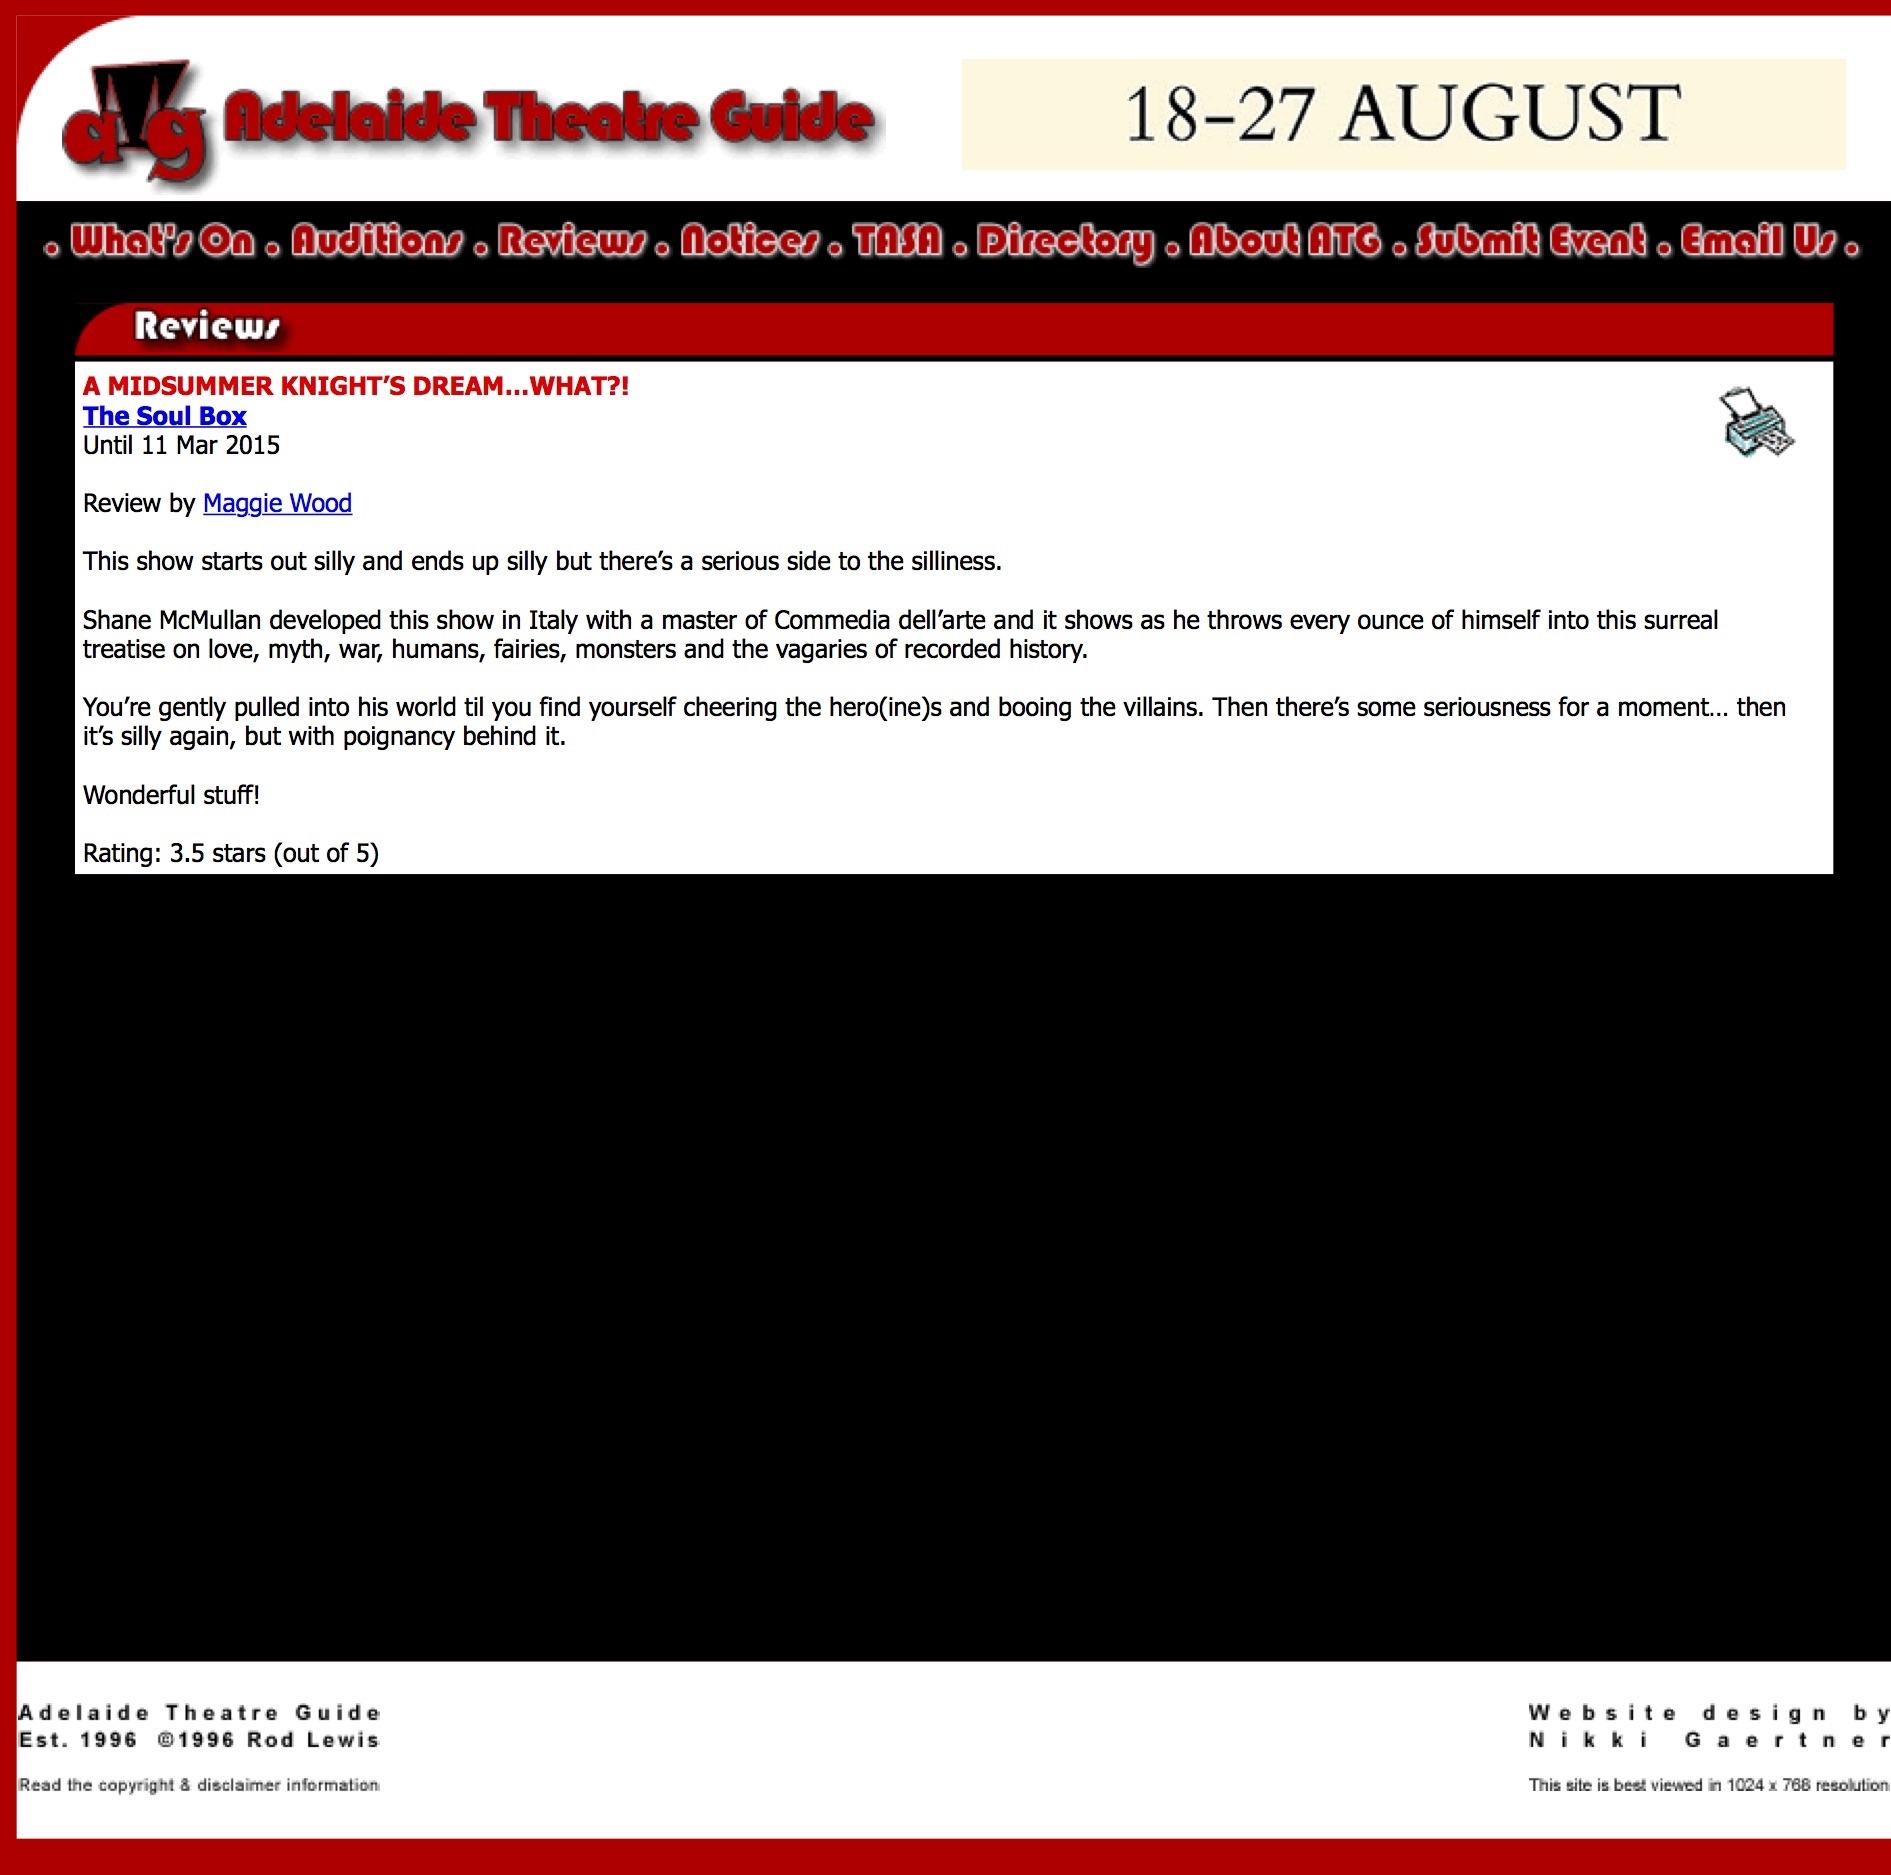 Adelaide Theatre Guide AMKDW.jpg